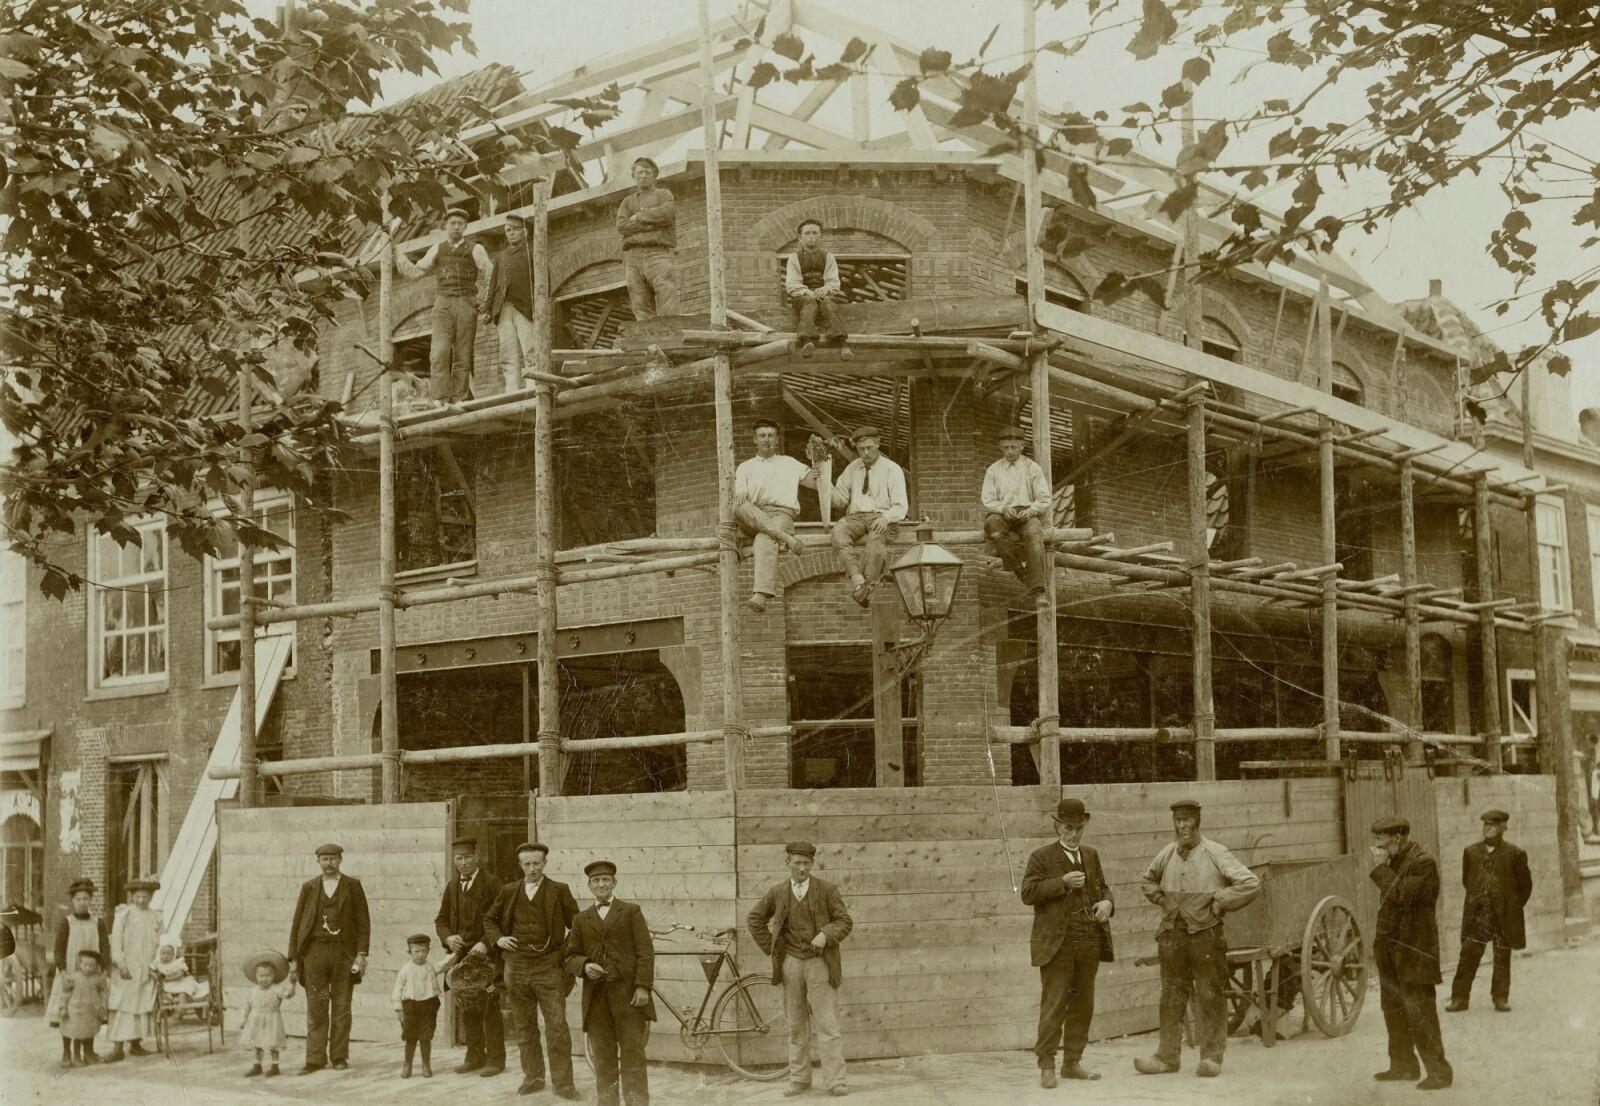 lf-1906-8-bouw-pand-zwennes-in-1906-tiff-pix-2000.jpg